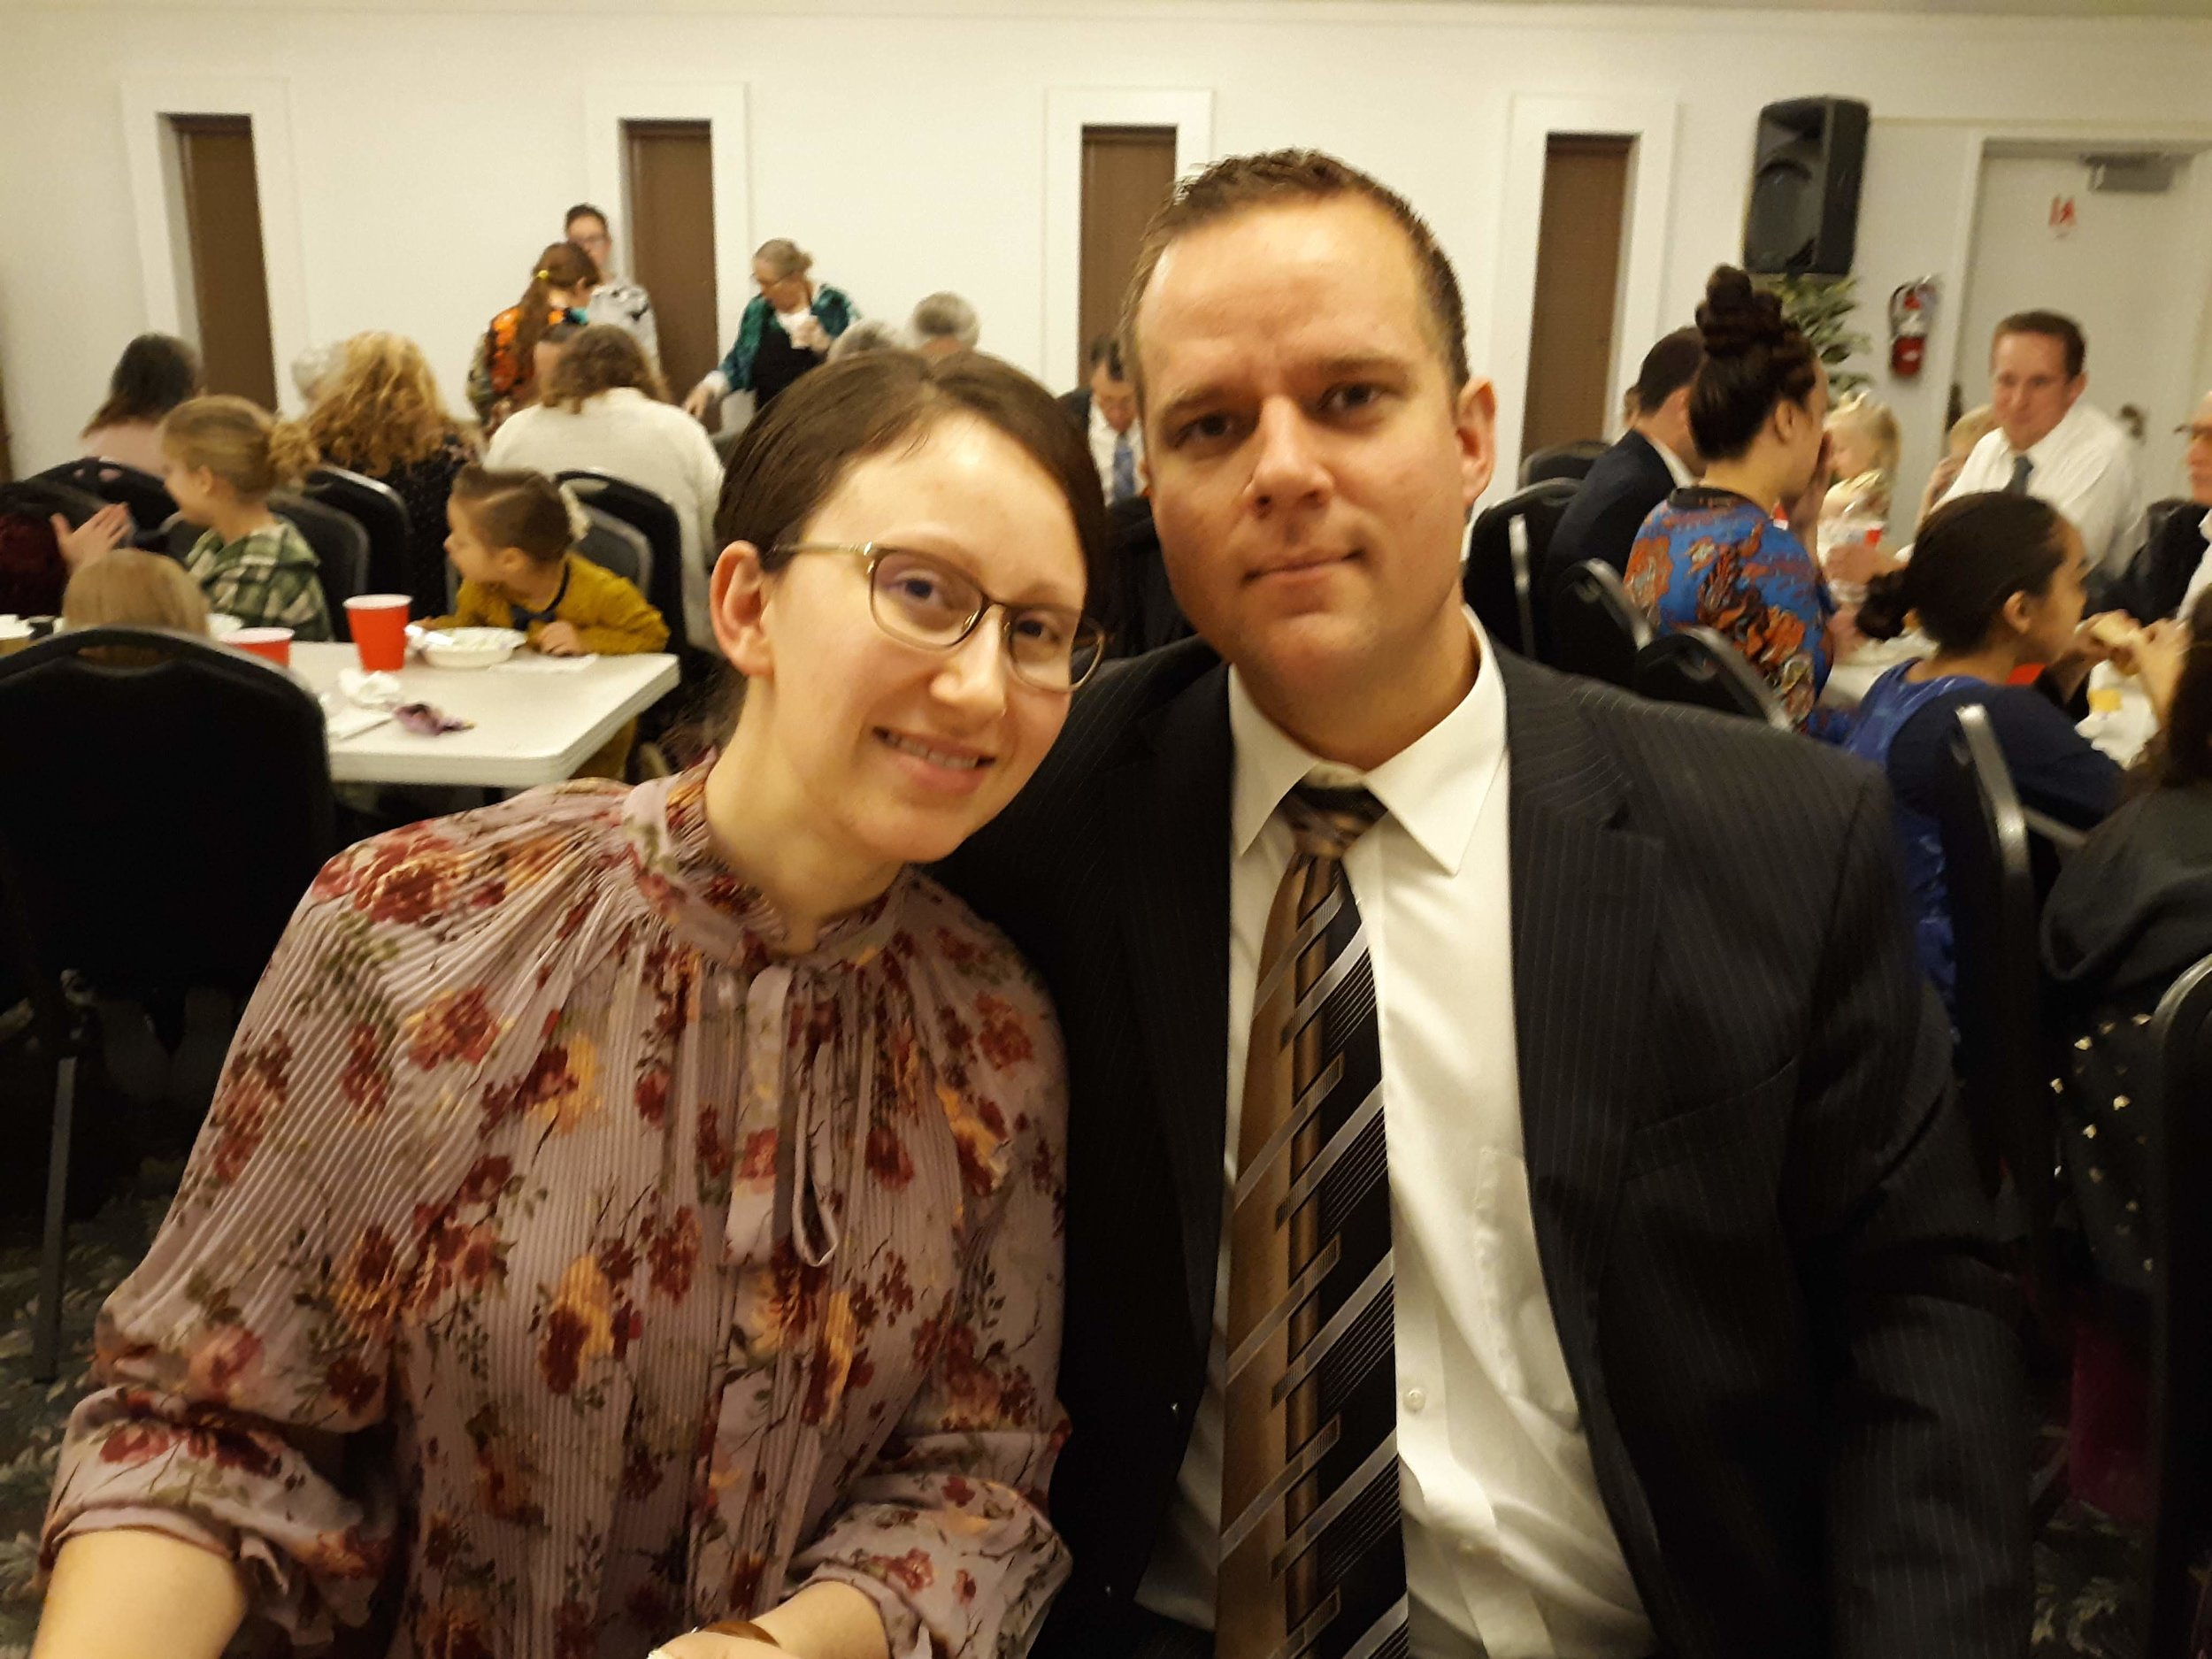 Sis. Jen and Bro. Matthew